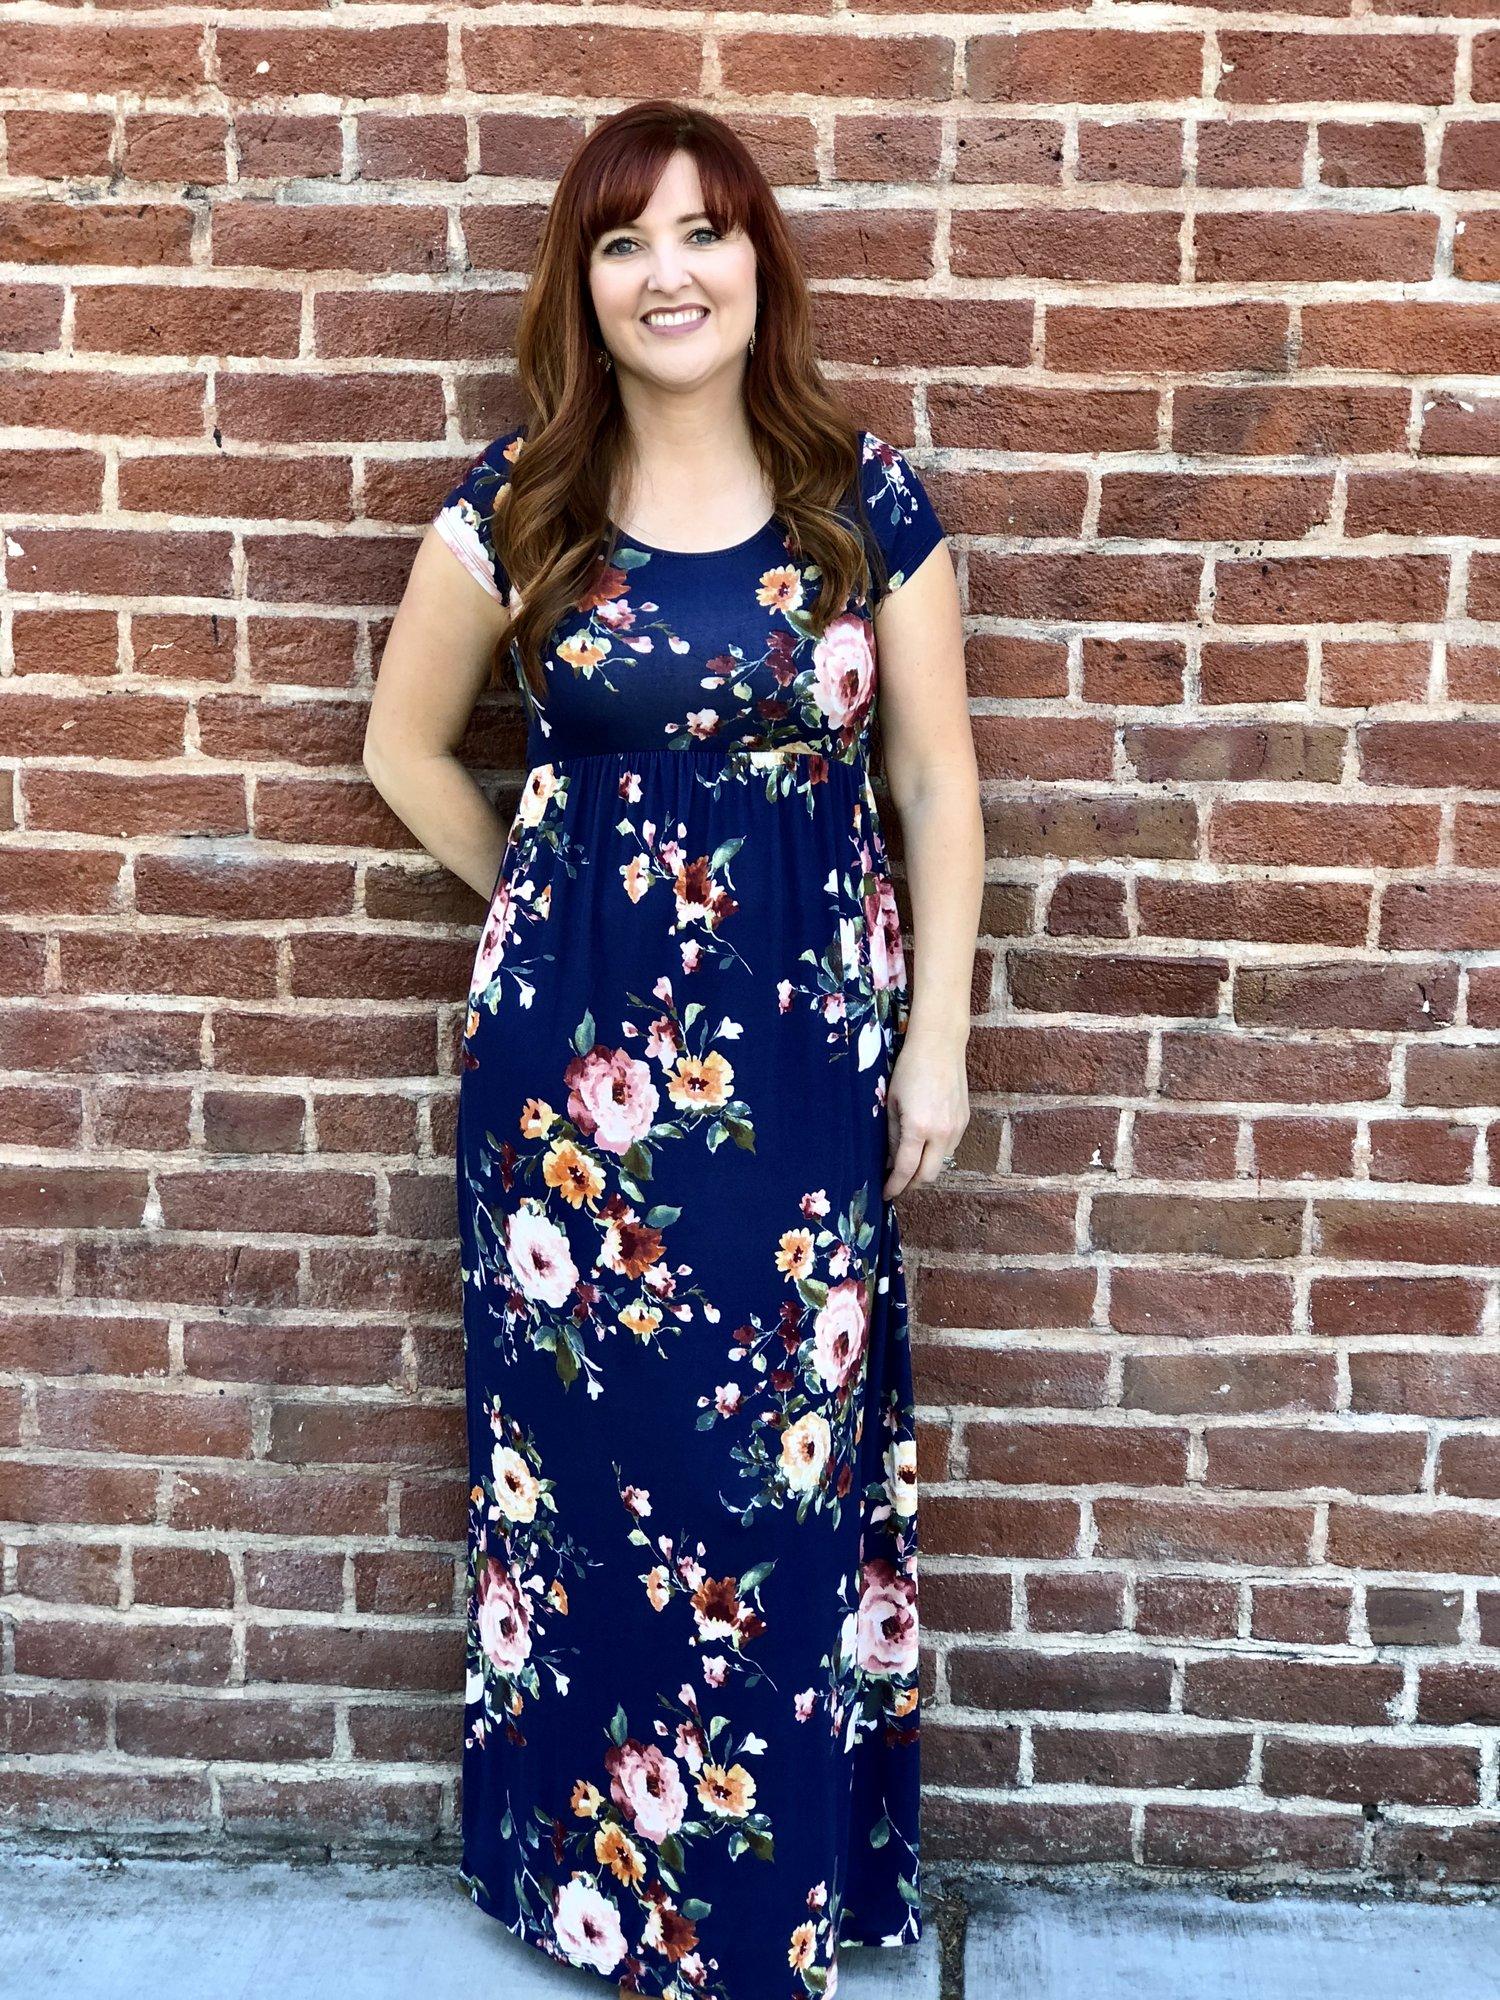 Let Me Call You Sweetheart Floral Blue Maxi Dress — Avonlea Lane e4823a028a3a